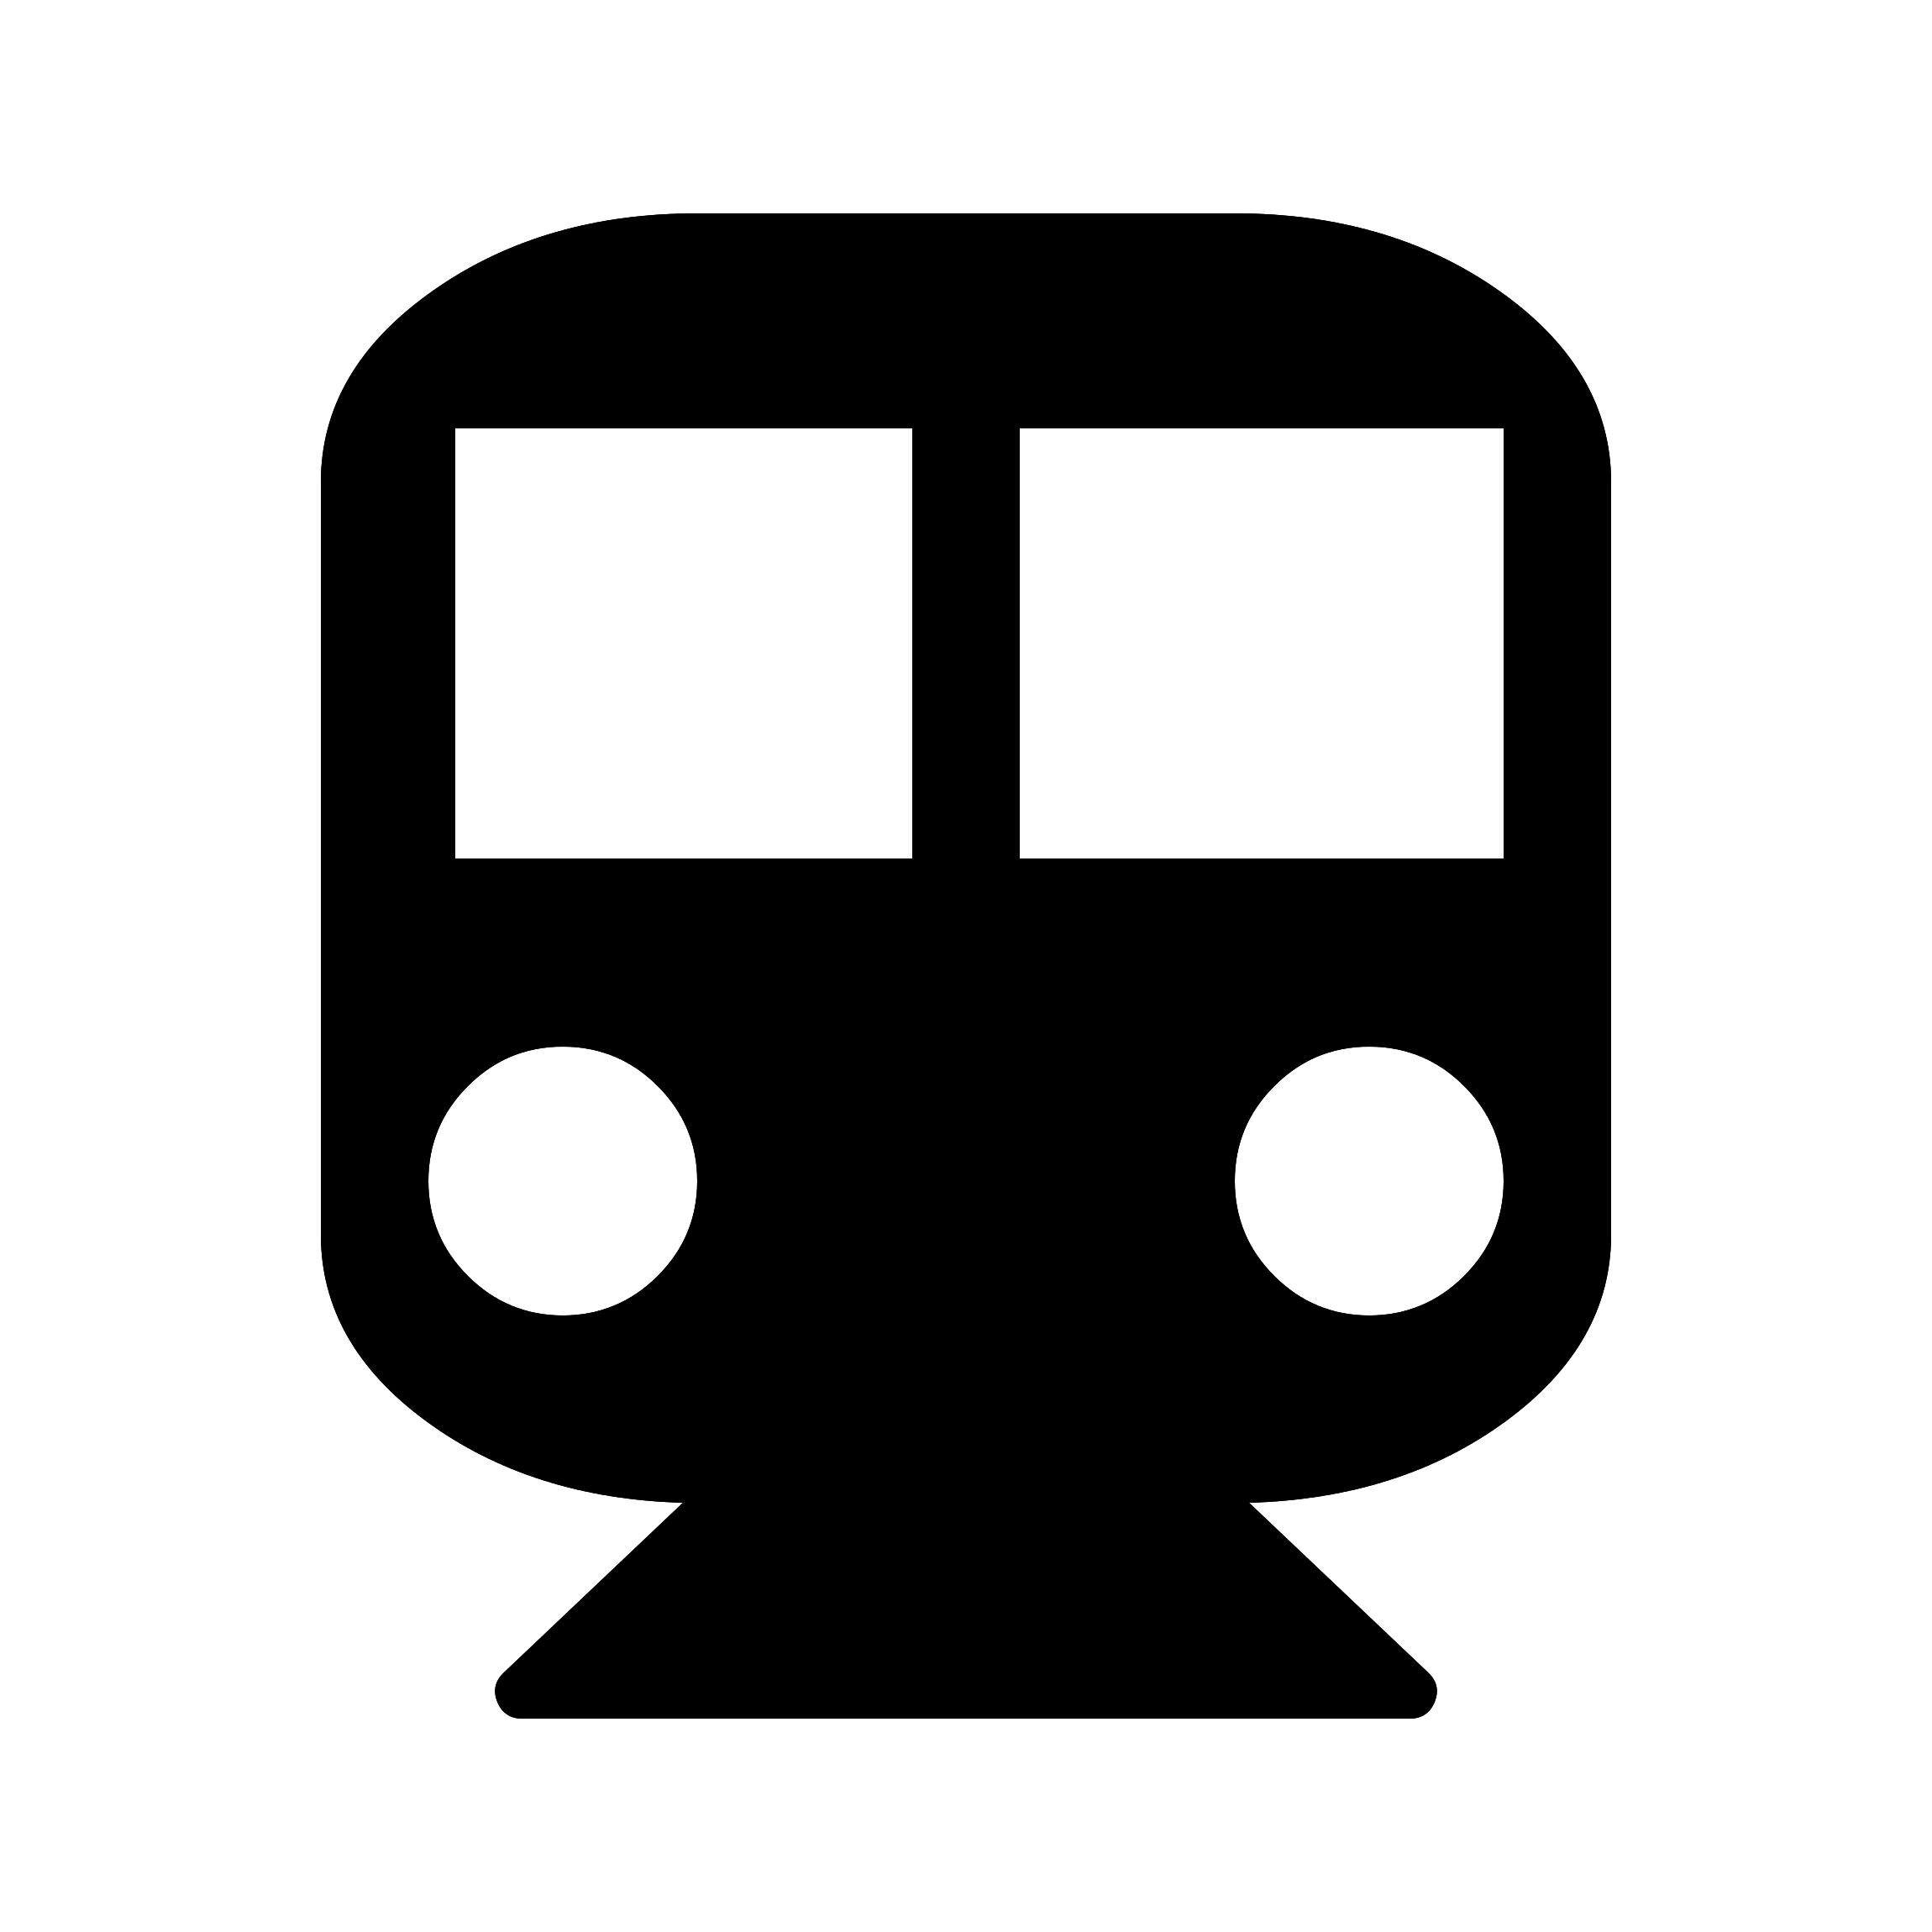 data/images/subway.png